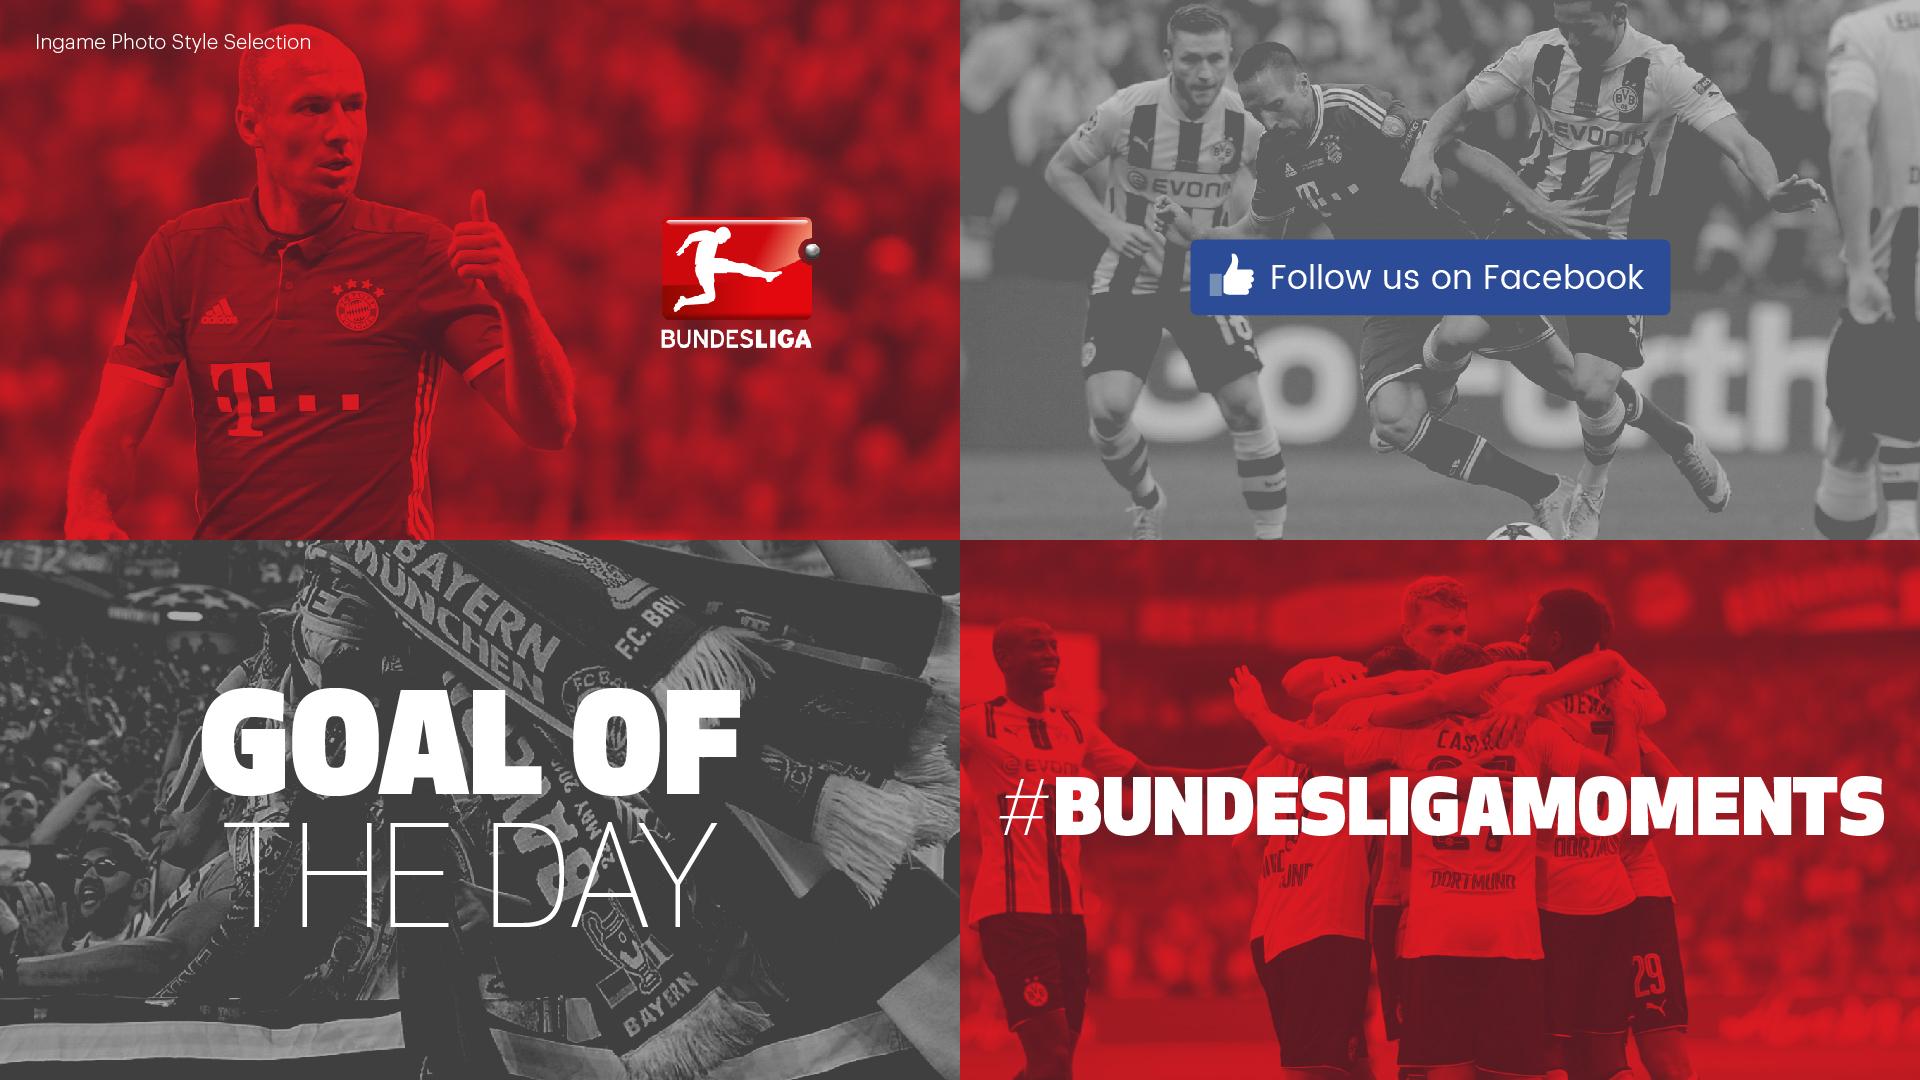 Bundesliga_Branding_16112016-04